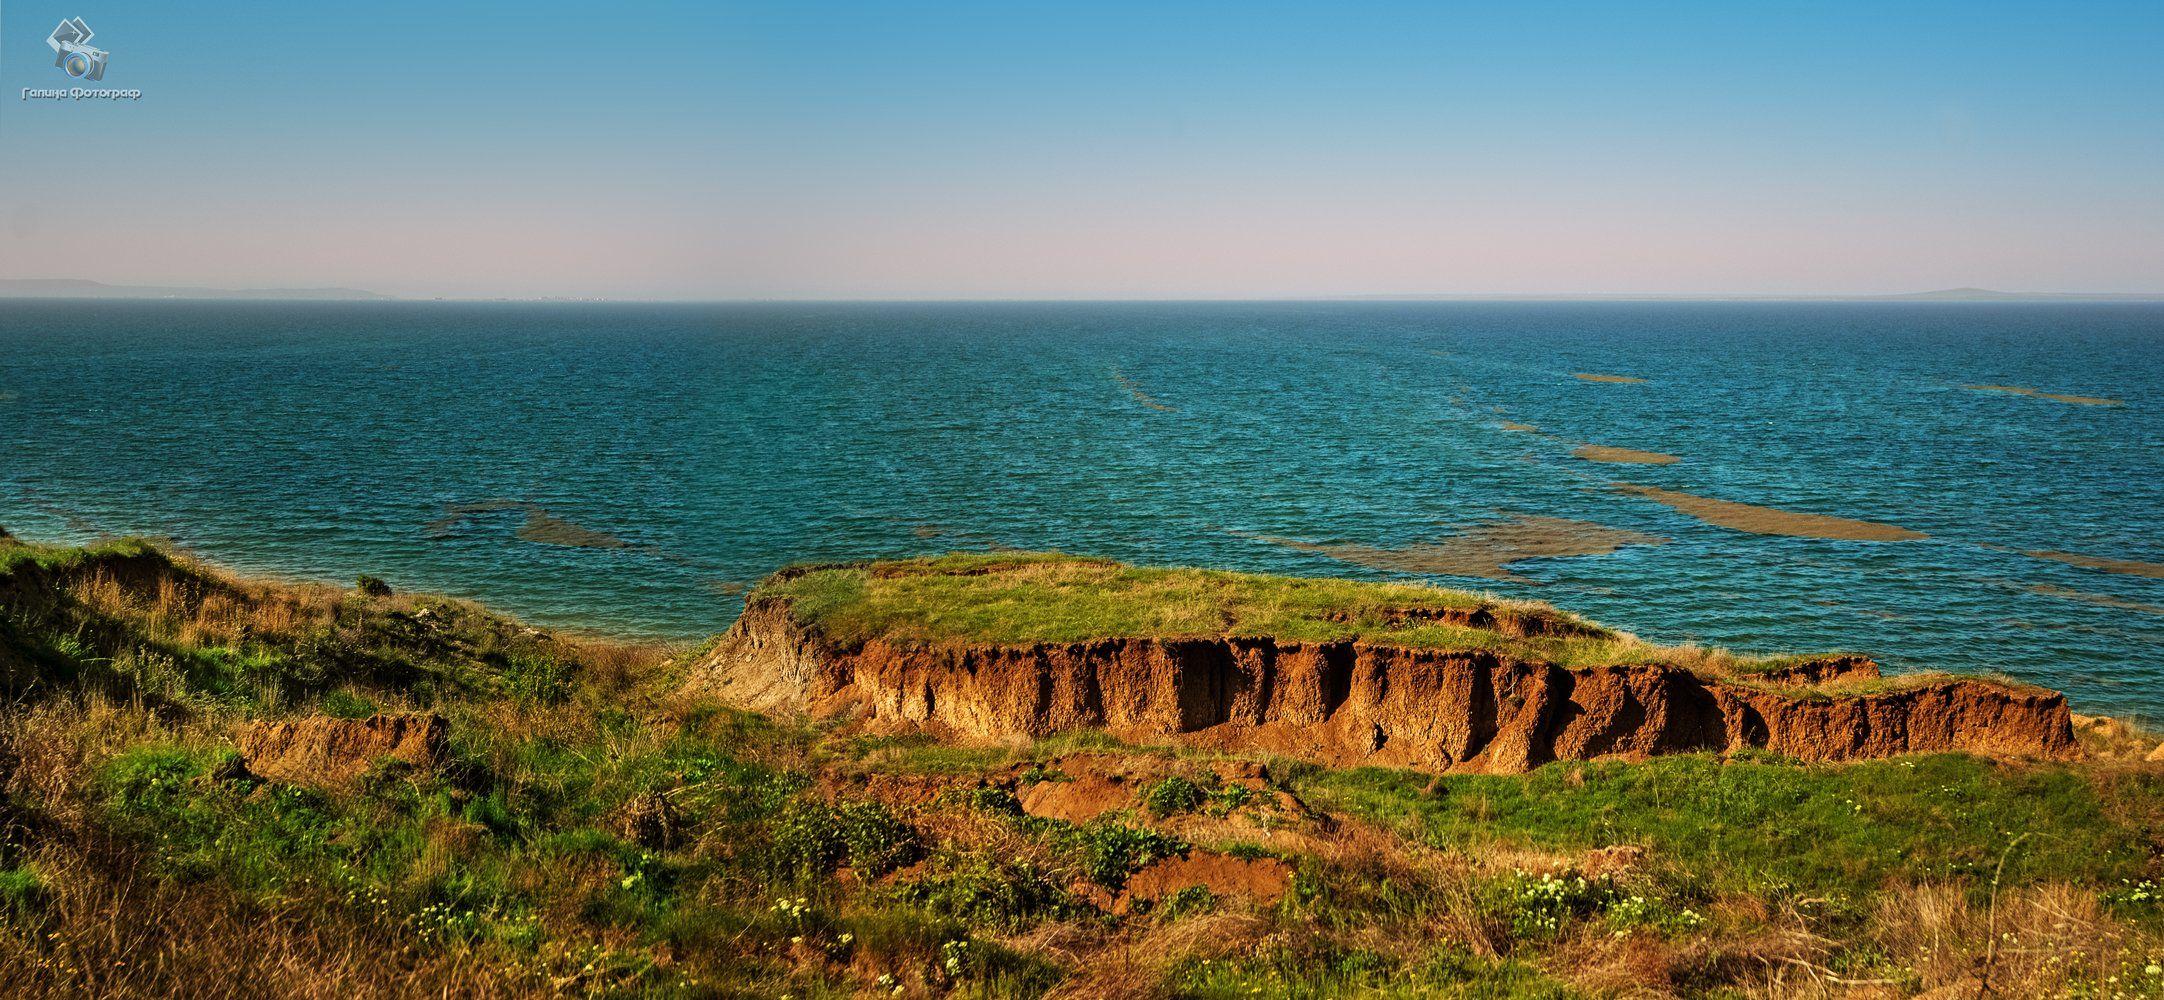 пейзаж, море, берег, холм, таманский залив, станица атамань, трава, земля, горизонт, природа, Галя